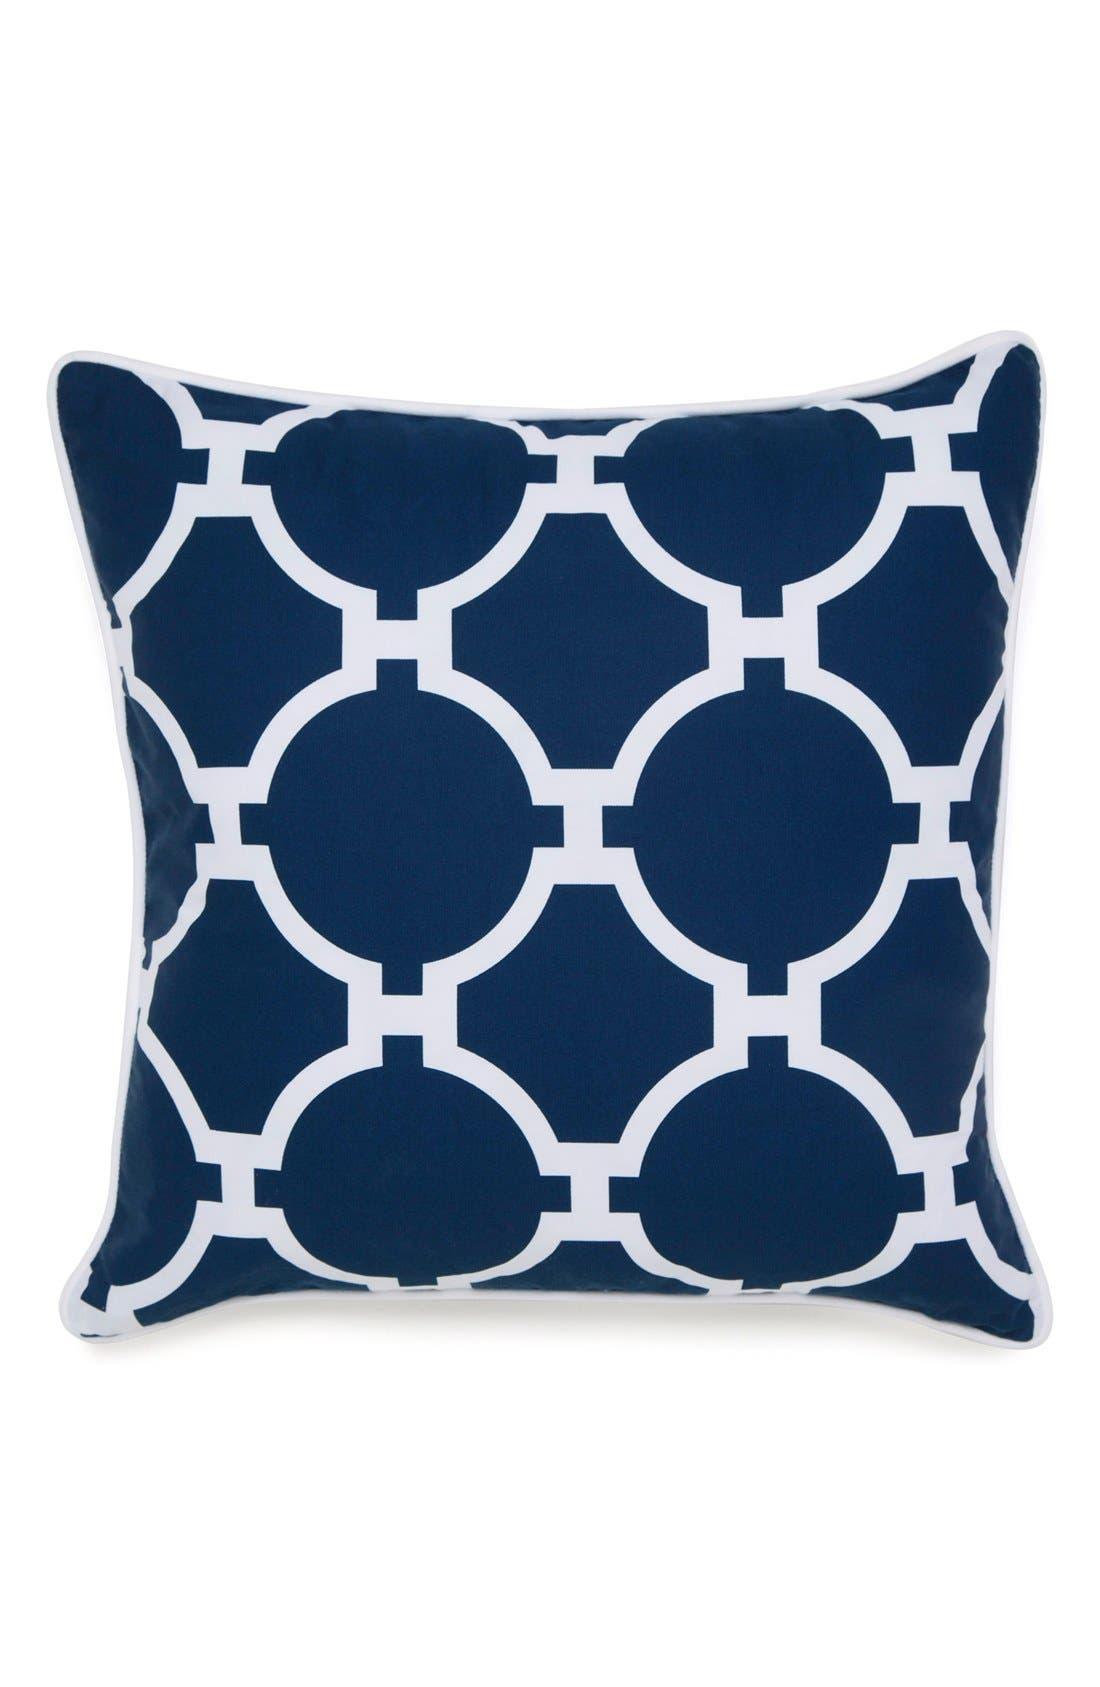 Main Image - Jill Rosenwald 'Copley Hampton Links' Pillow